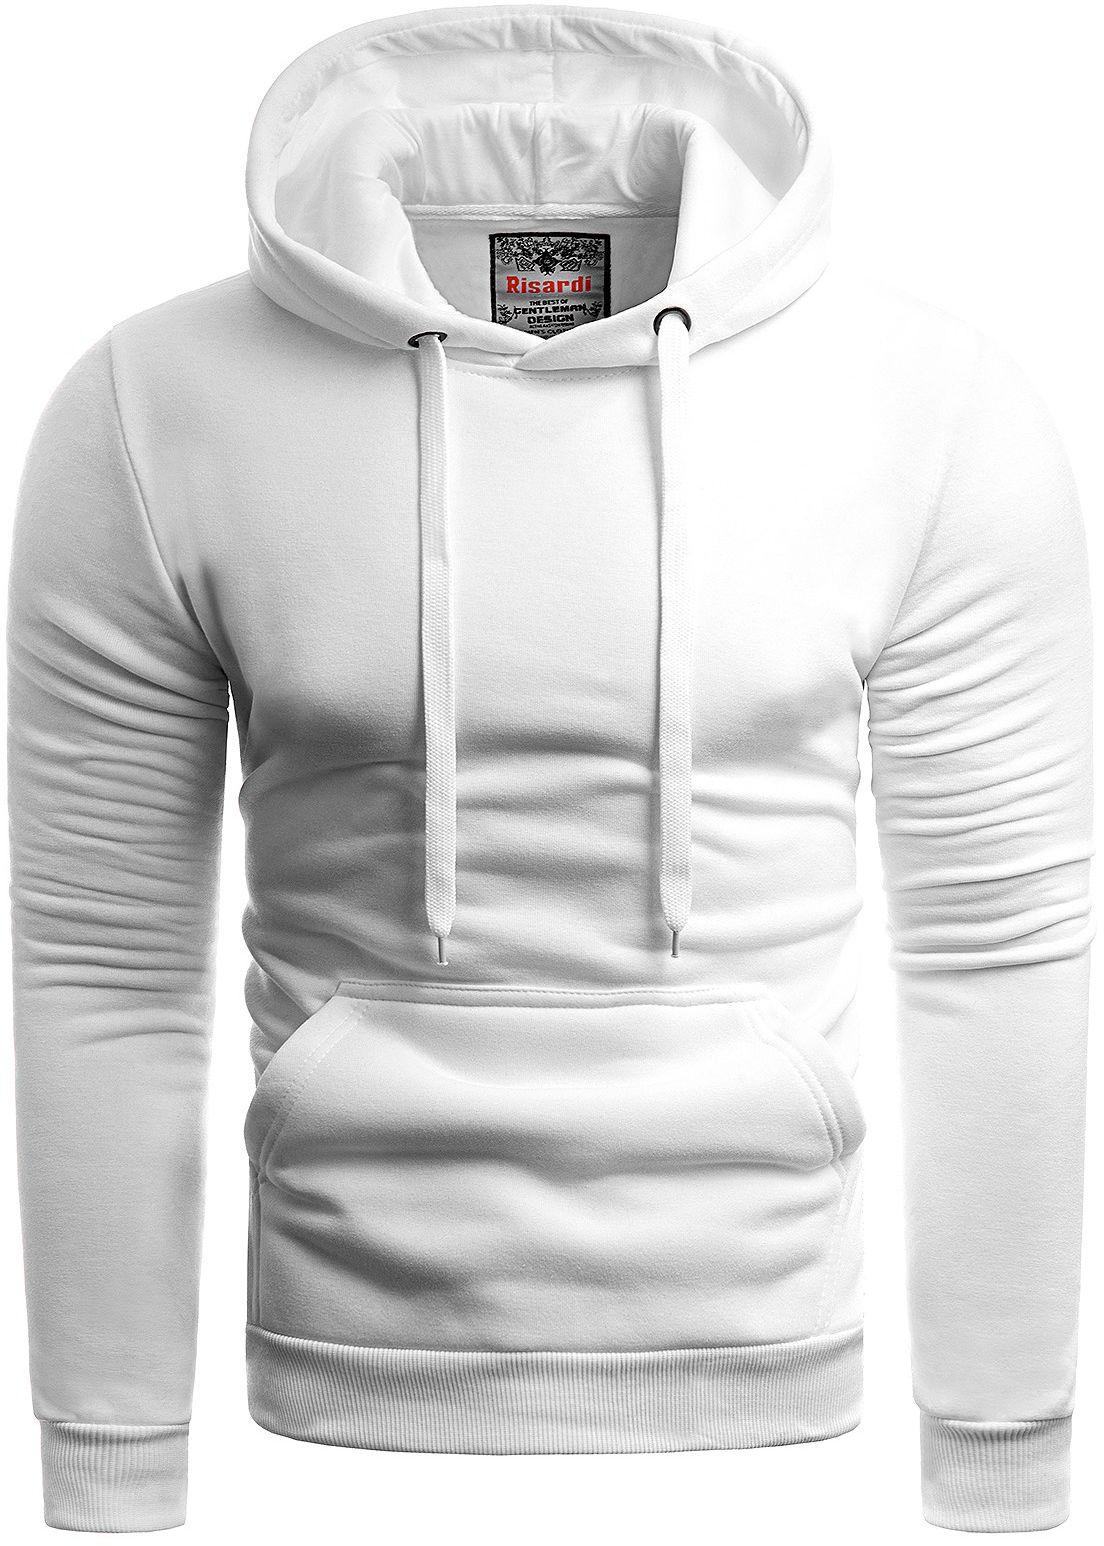 Męska modna bluza sg1- biała